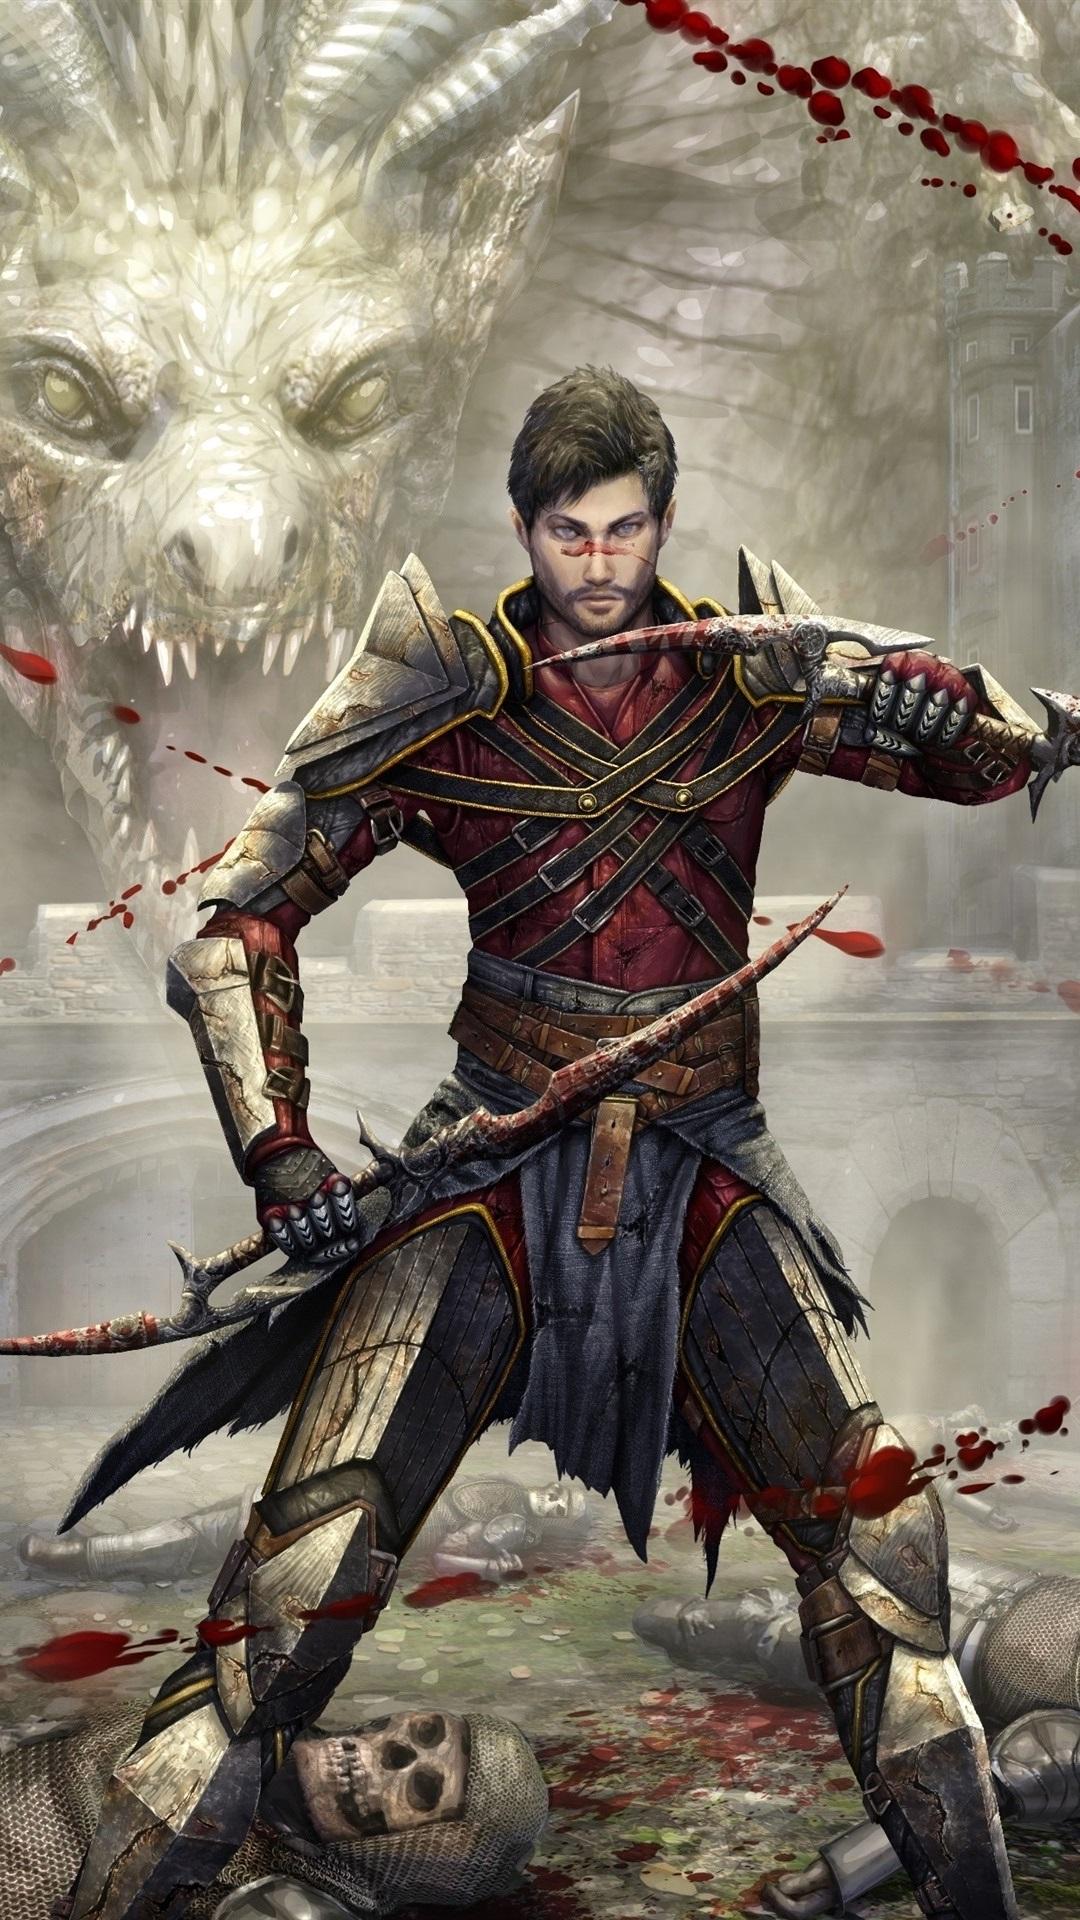 Dragon Age Pc Game 1080x1920 Iphone 8 7 6 6s Plus Wallpaper